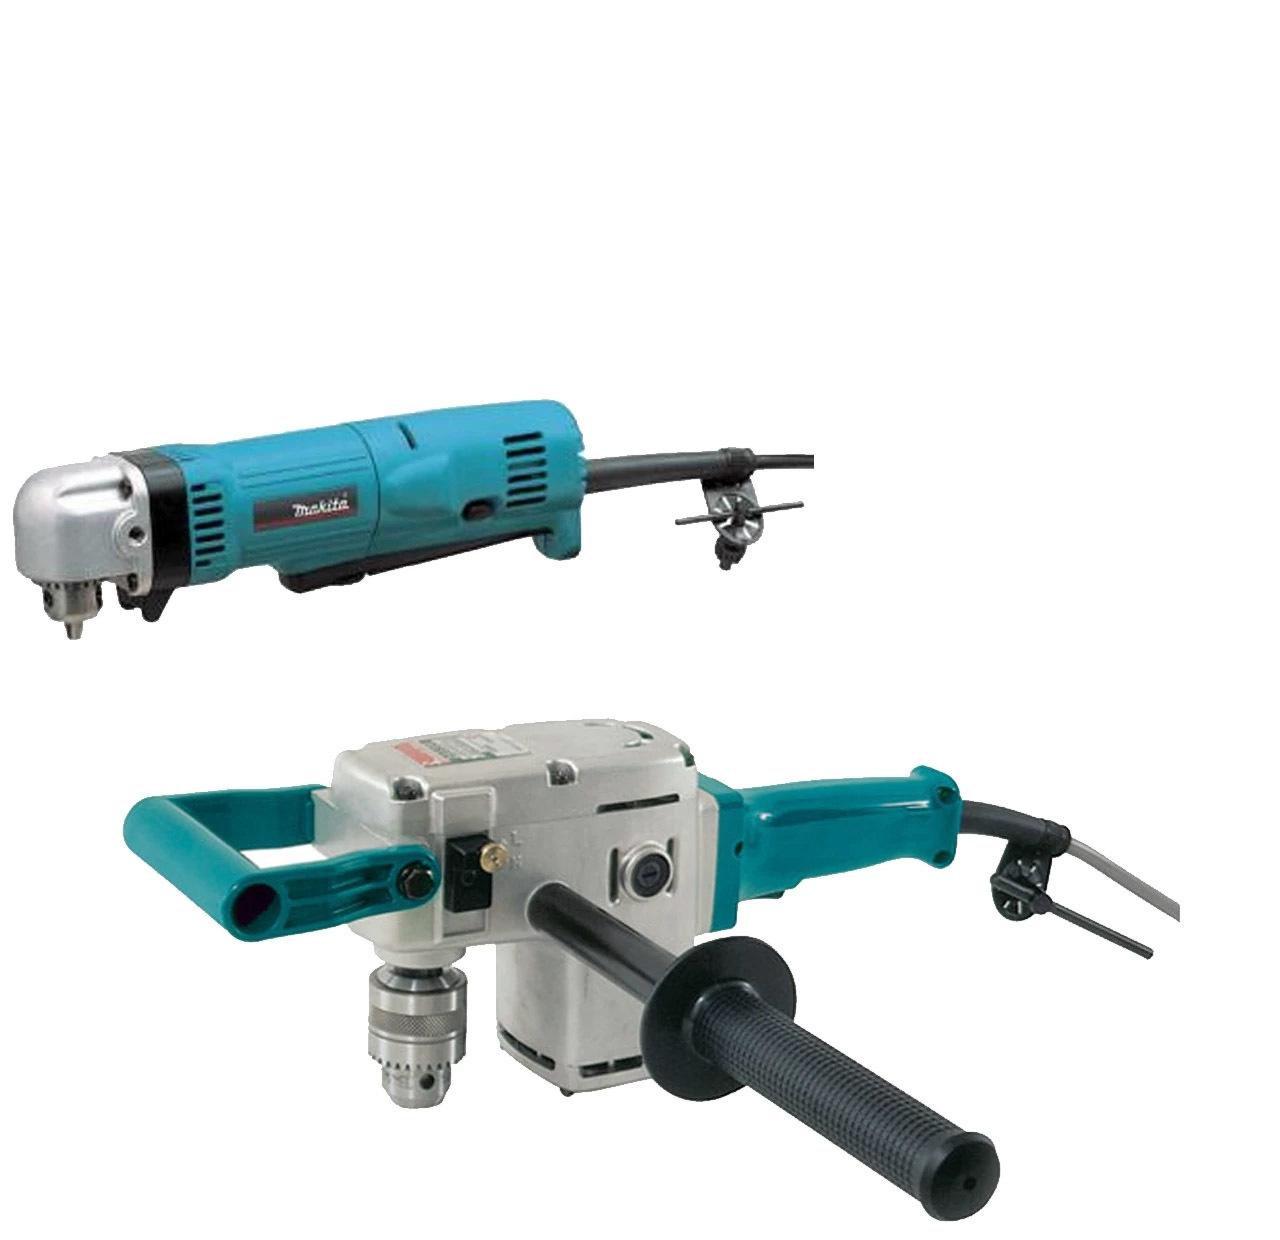 Branded Power Tools Online Sale